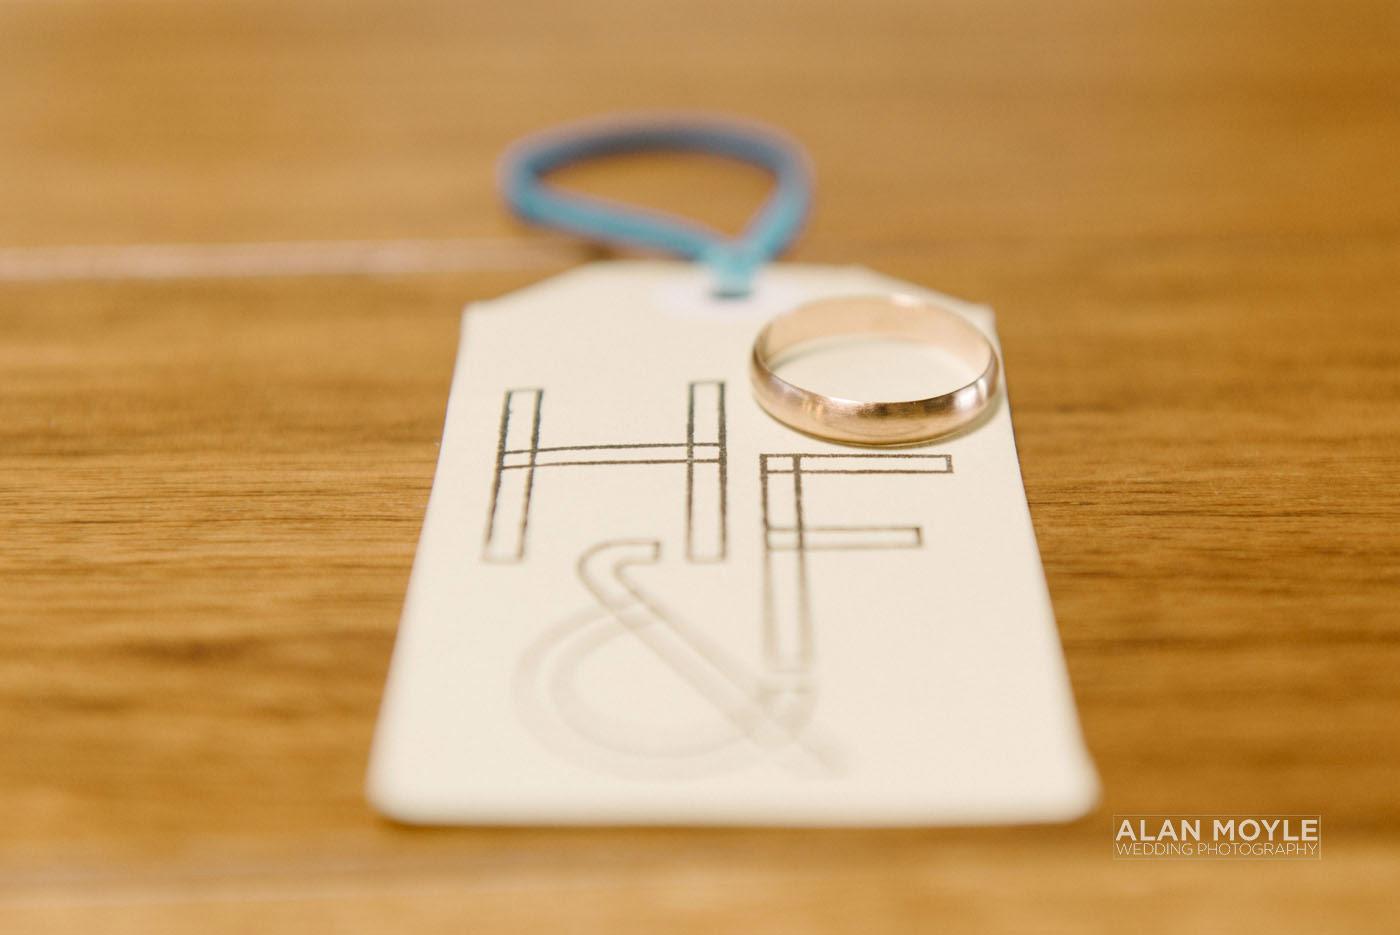 1410kershaw-014-melbourne_wedding_photographer_photography_larwill_studio_orange_elope_bride_blue_bayside_photobat_alan_moyle_winebar_port_melbourne_rings.jpg